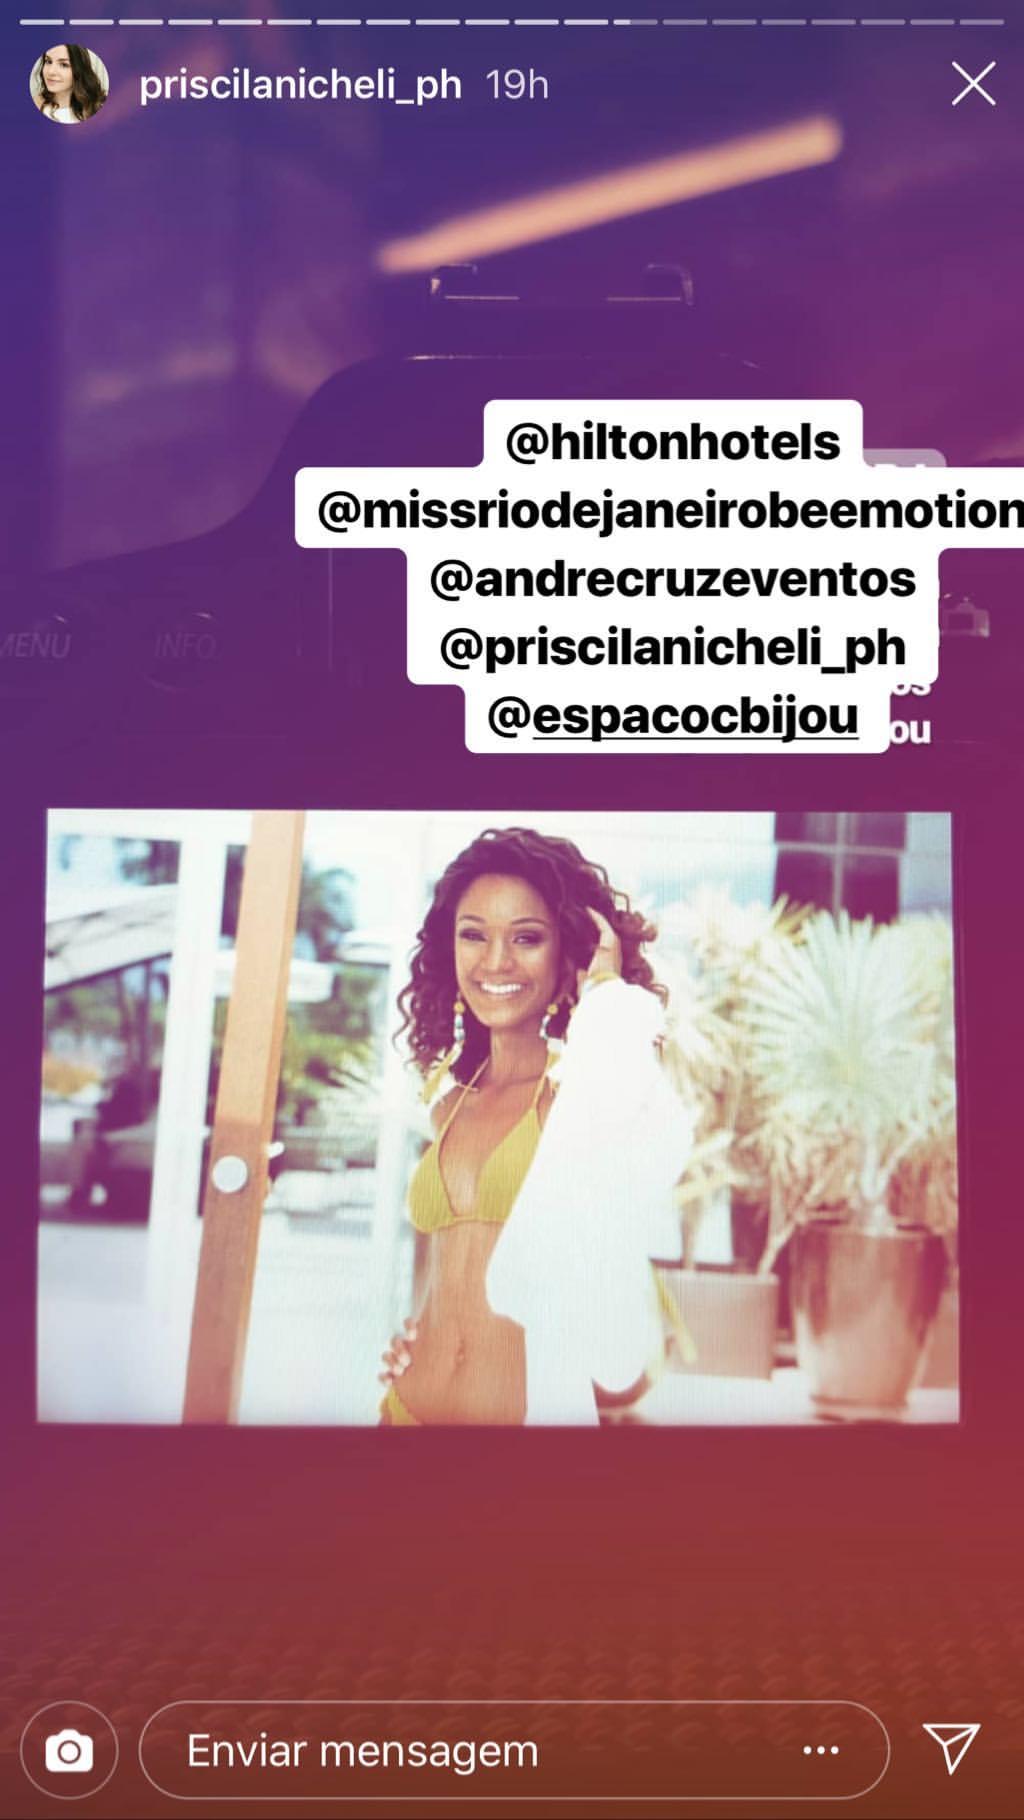 thaina de oliveira, miss teresopolis 2019. - Página 3 49422010